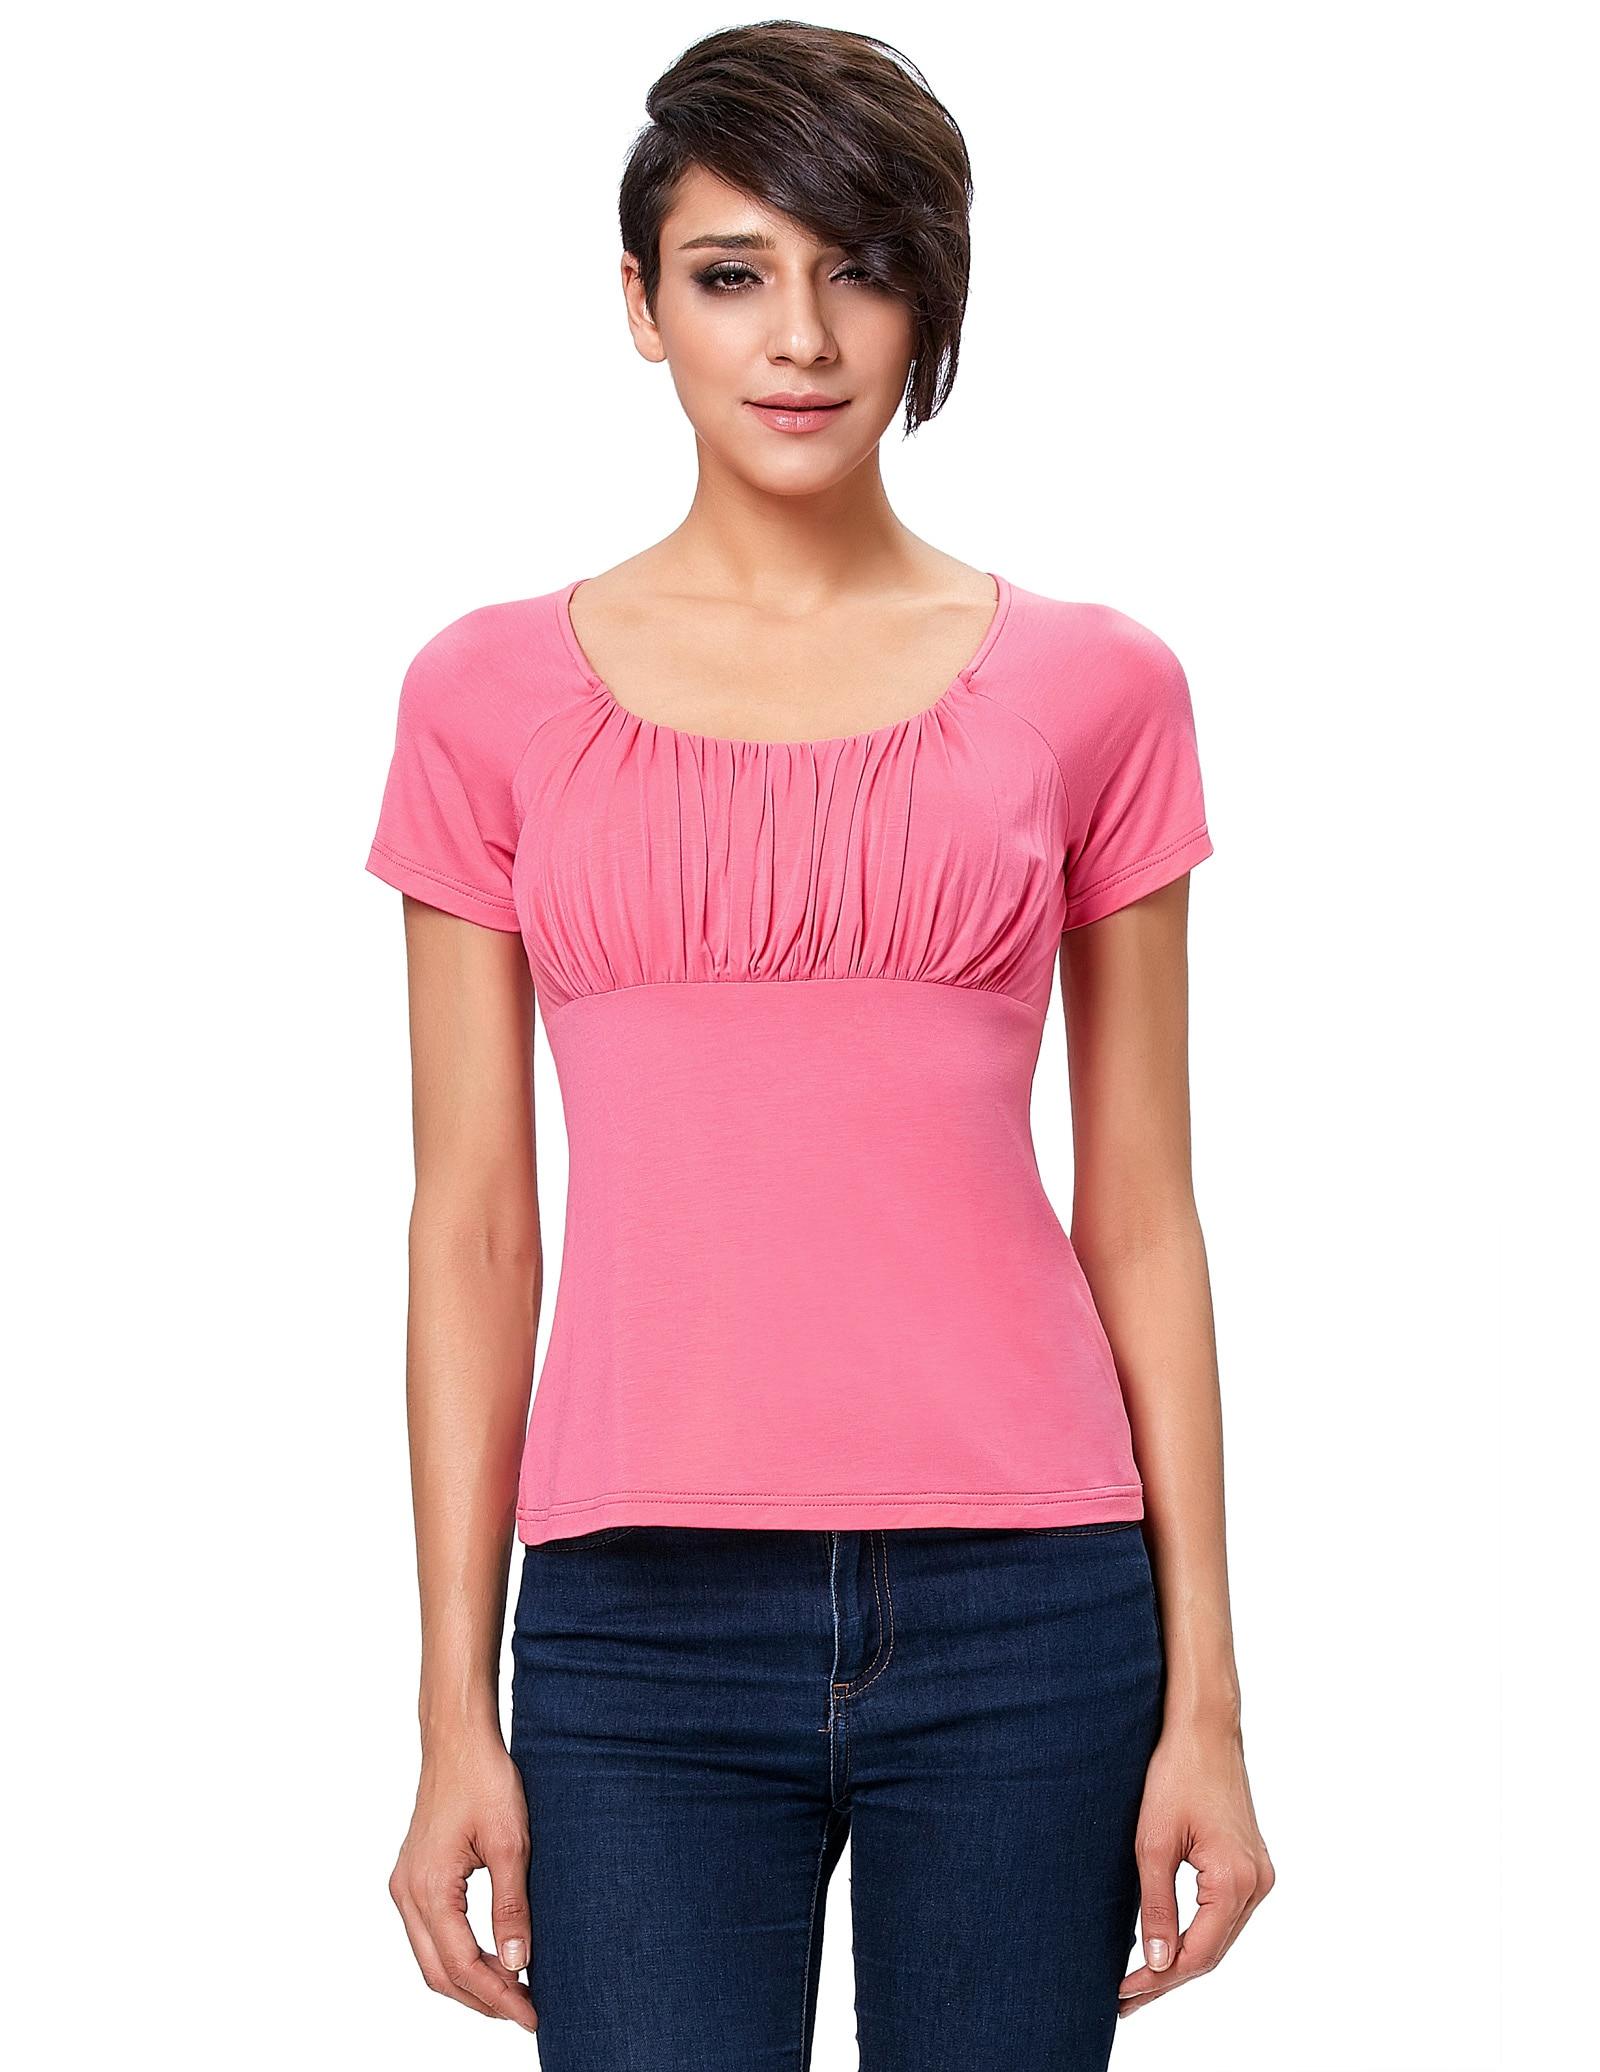 stock pink Women blouse elegant wrap chest slim body shirt Short Sleeve Scoop Neck Empire Waist Raglan cotton blouse Top